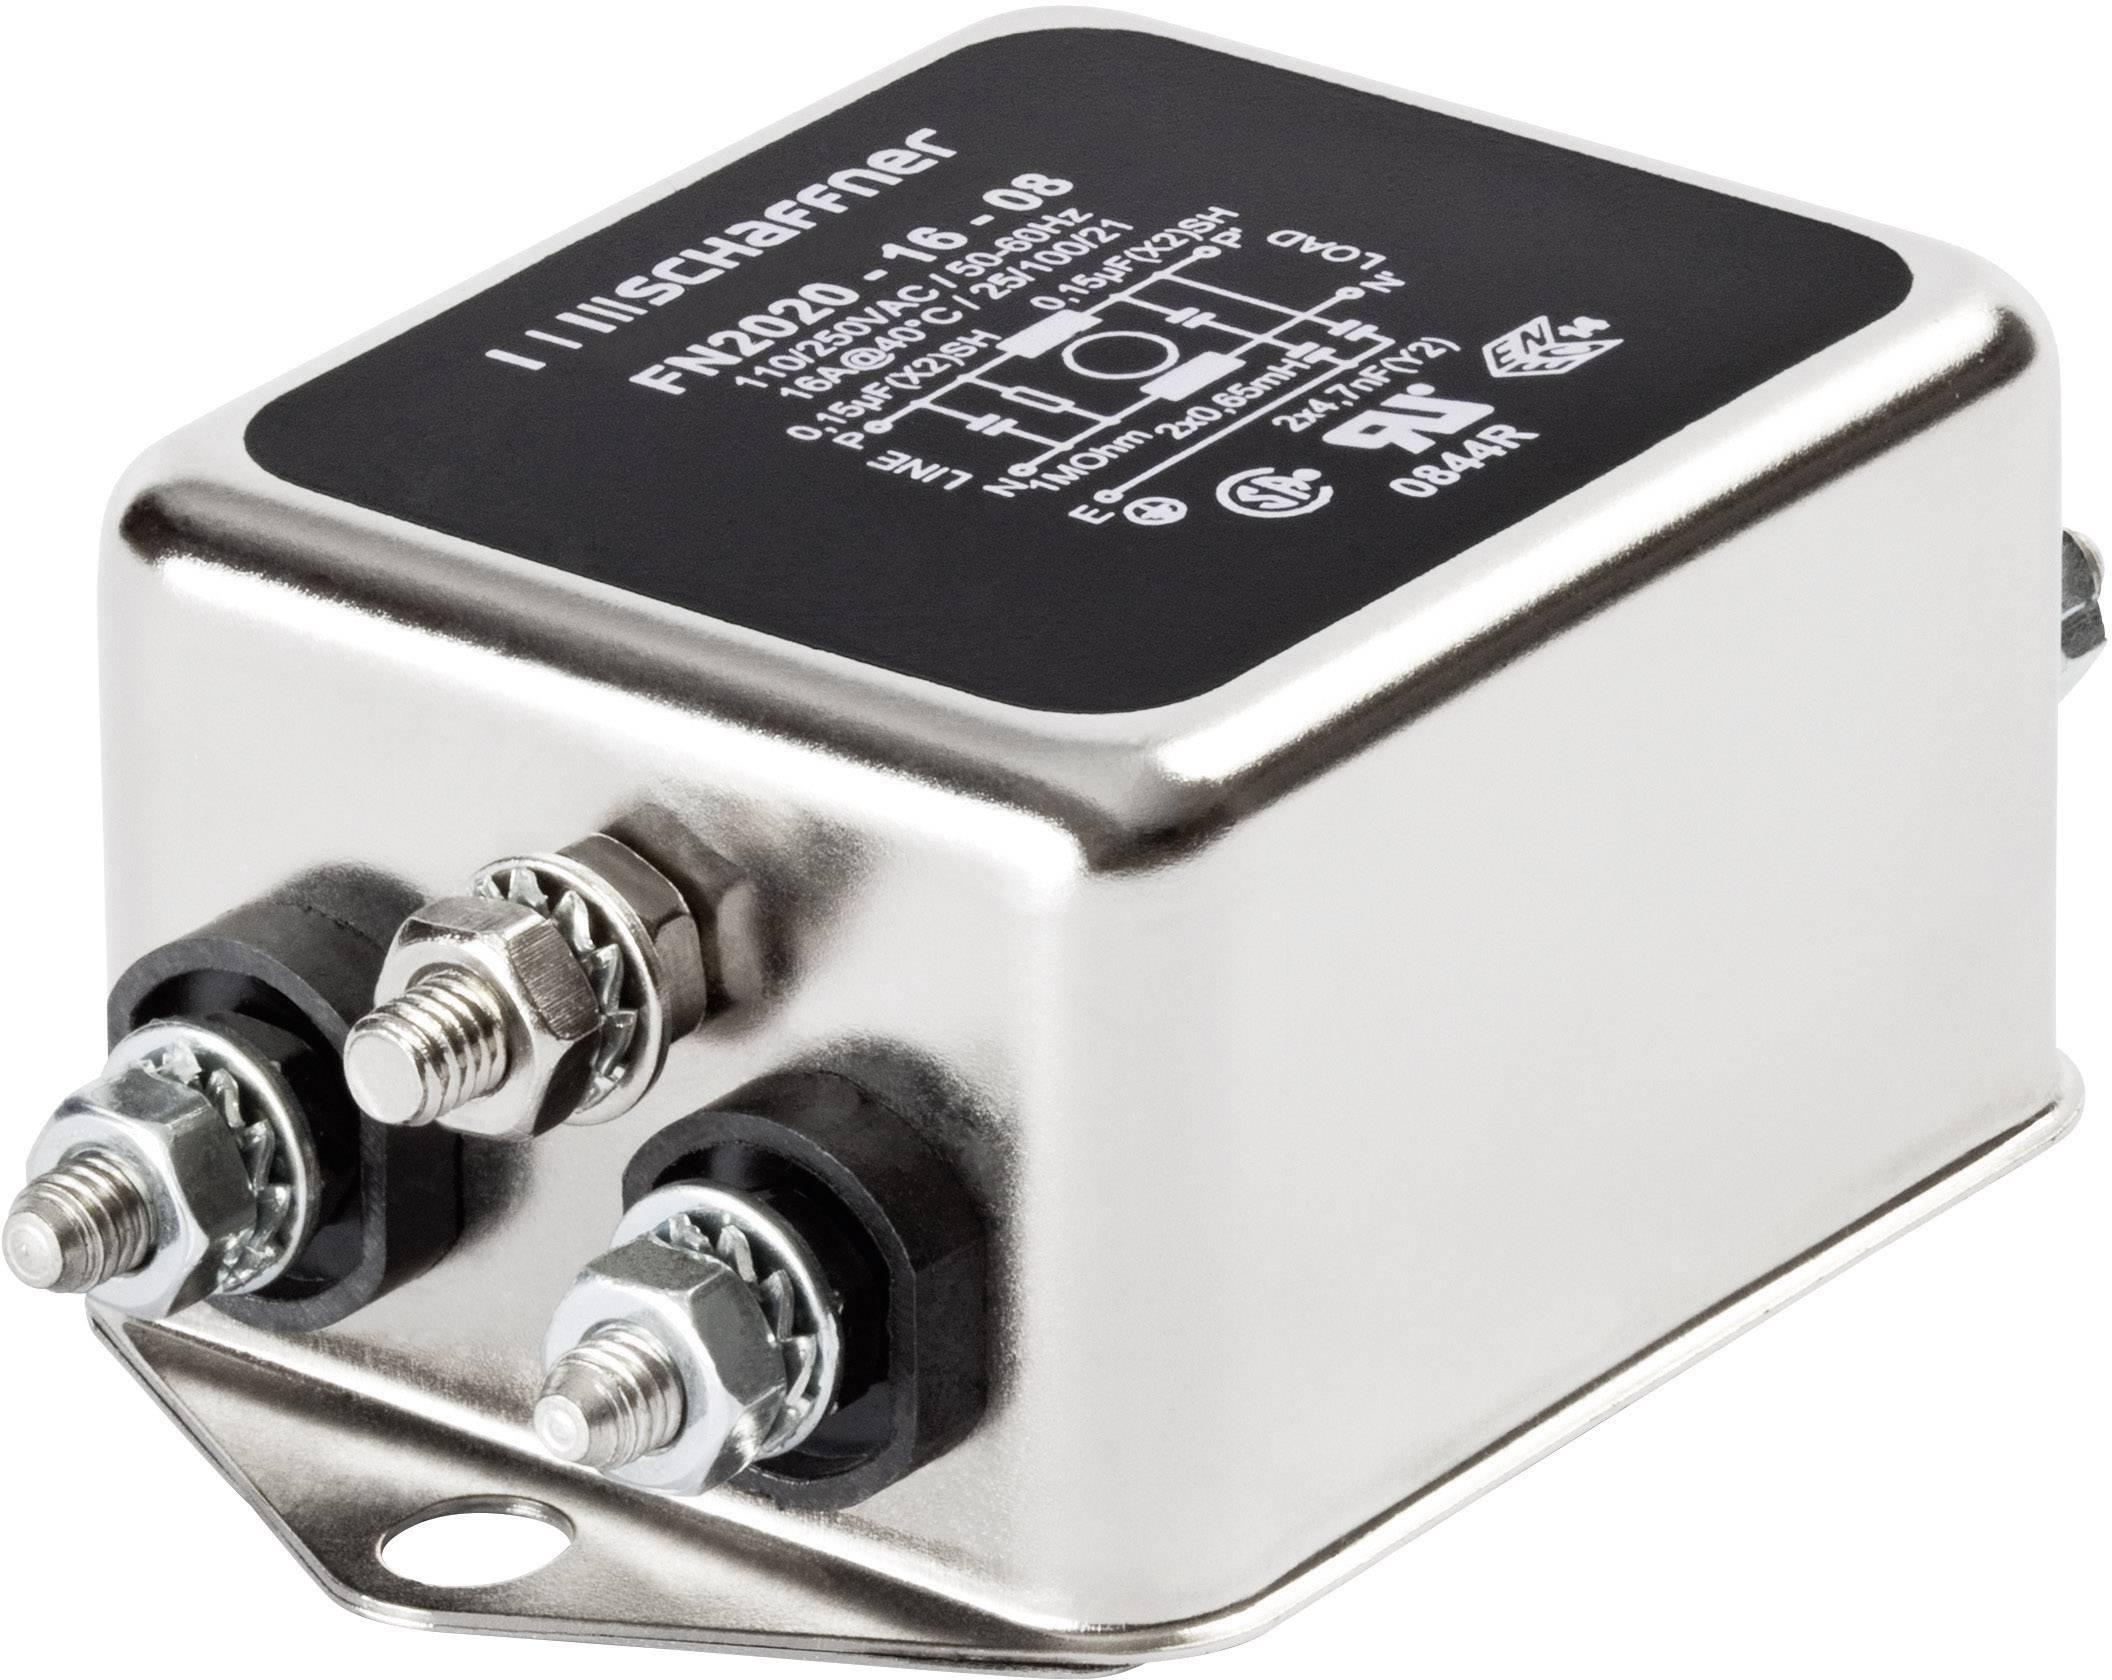 Síťový filtr Schaffner, FN 2020-12-06, 0,7 mH, 250 V/AC, 12 A